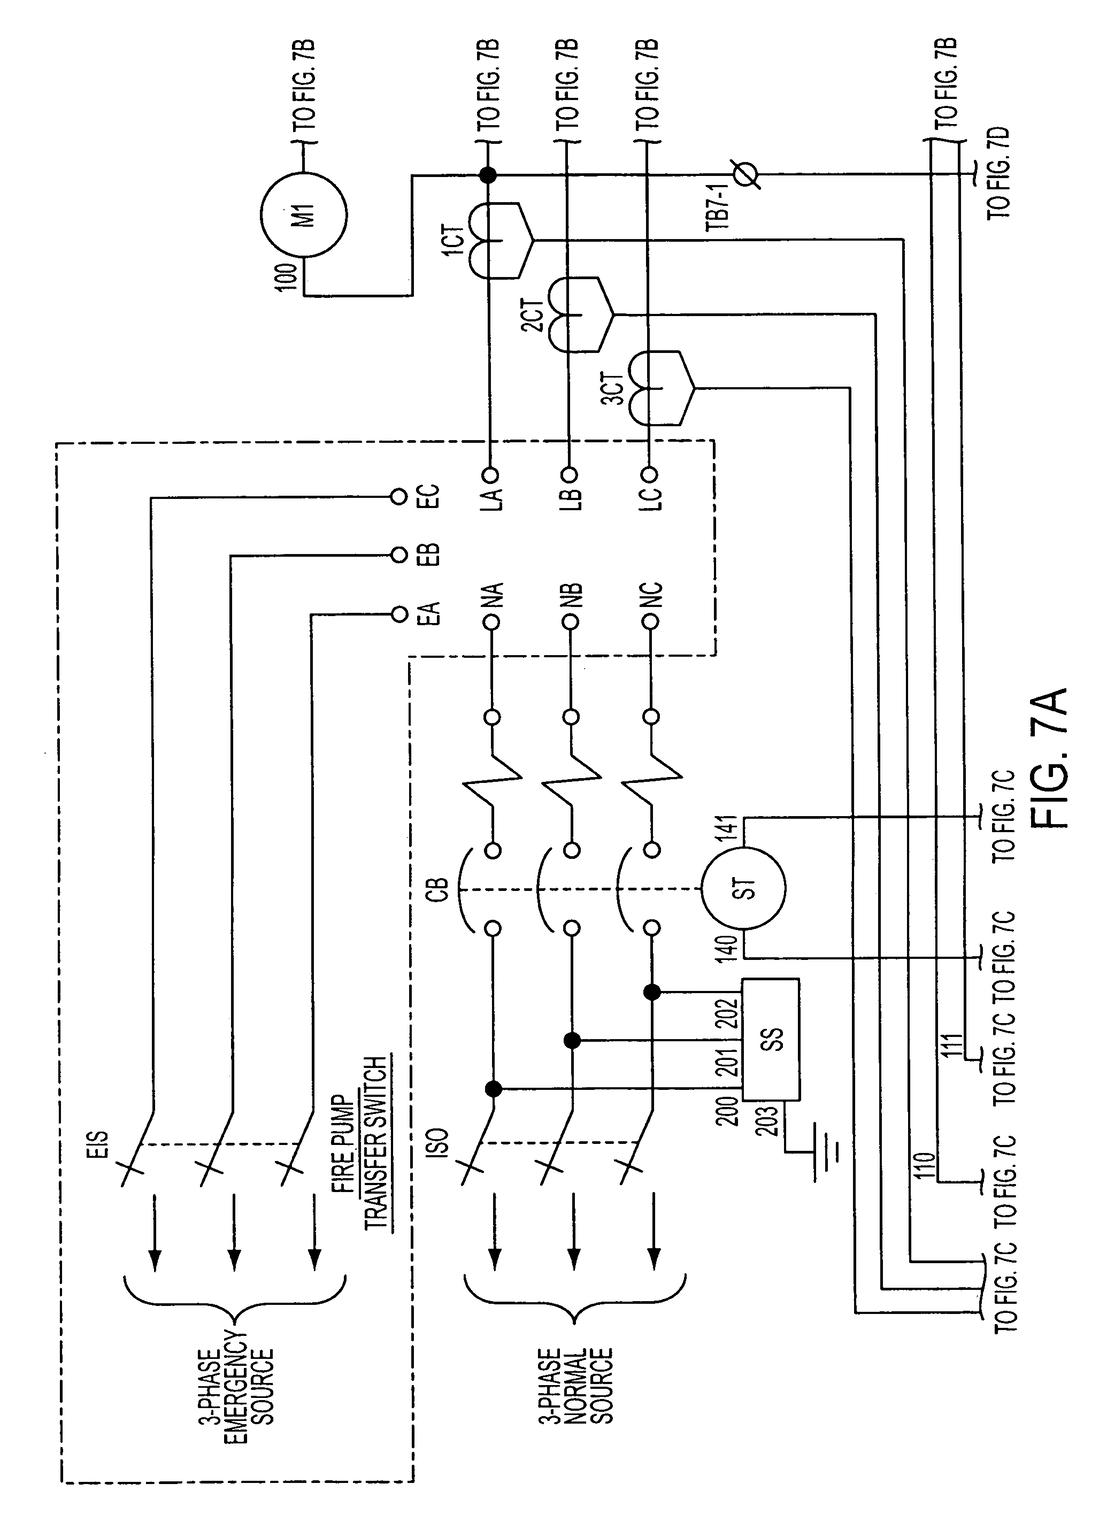 AS_0088] Pump Motor Schematic Diagram Wiring DiagramAthid Ynthe Funi Icism Viewor Mohammedshrine Librar Wiring 101